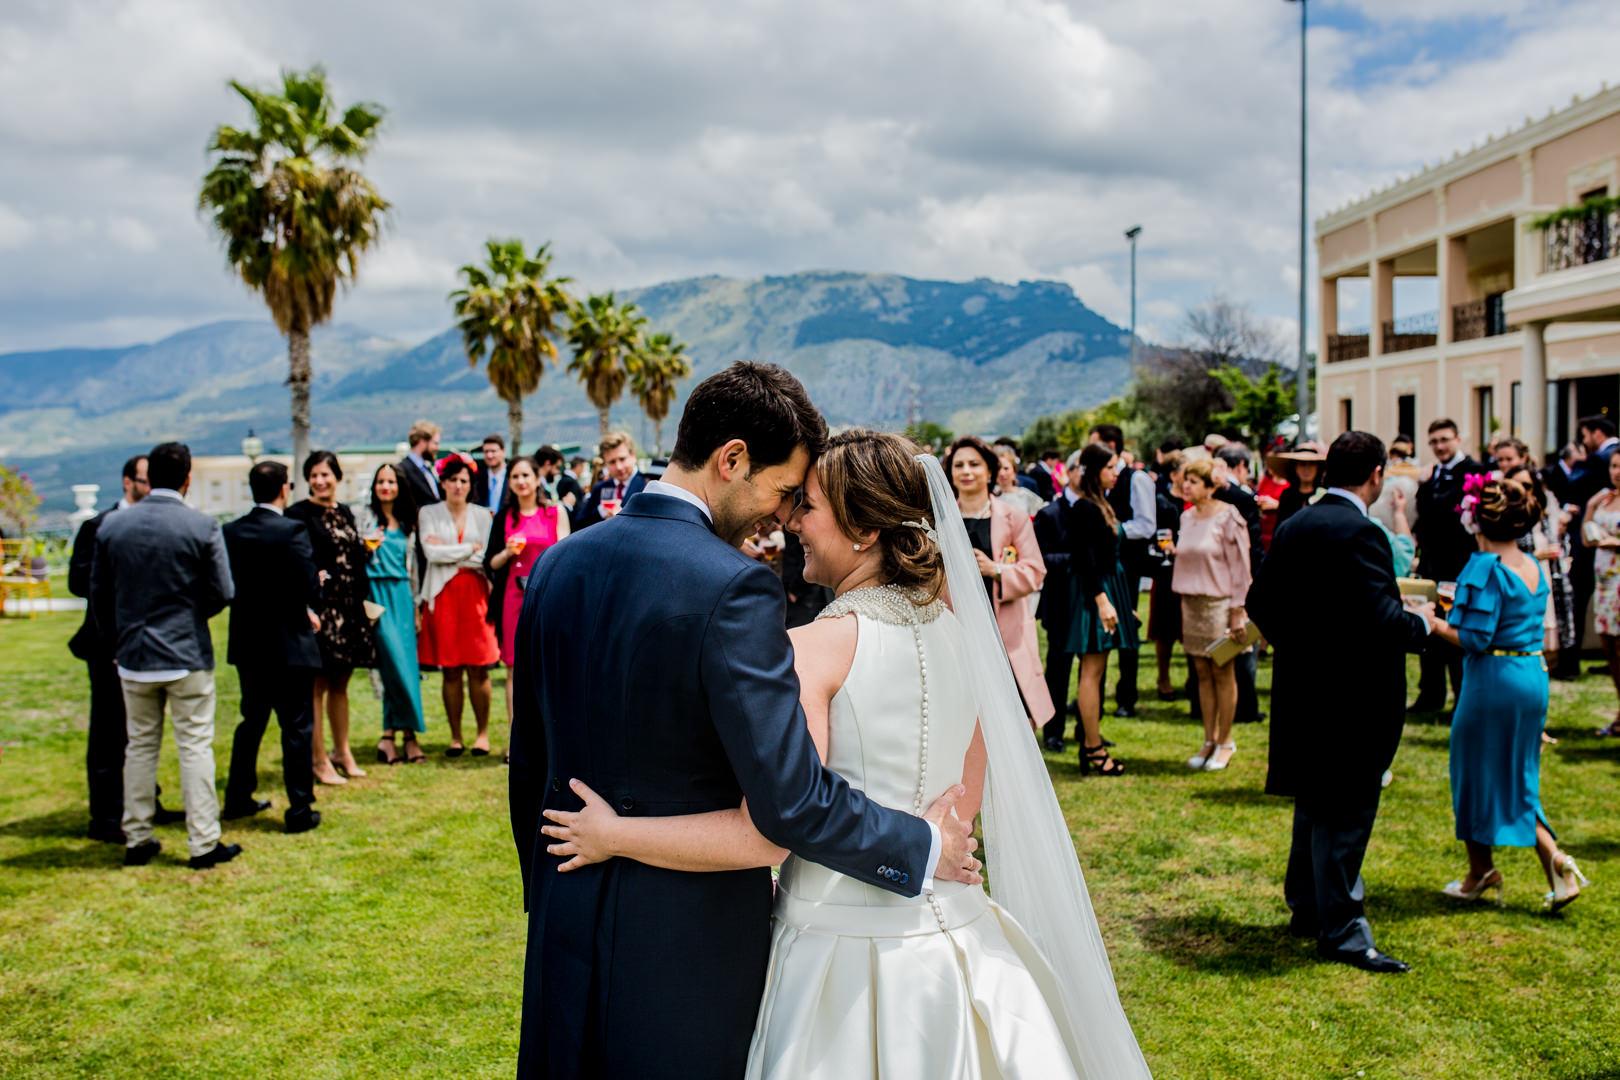 Boda-Catedral-Jaen-Hamburgo-Maria-David-engagement-Rafael-Torres-fotografo-bodas-sevilla-madrid-barcelona-wedding-photographer--34.jpg